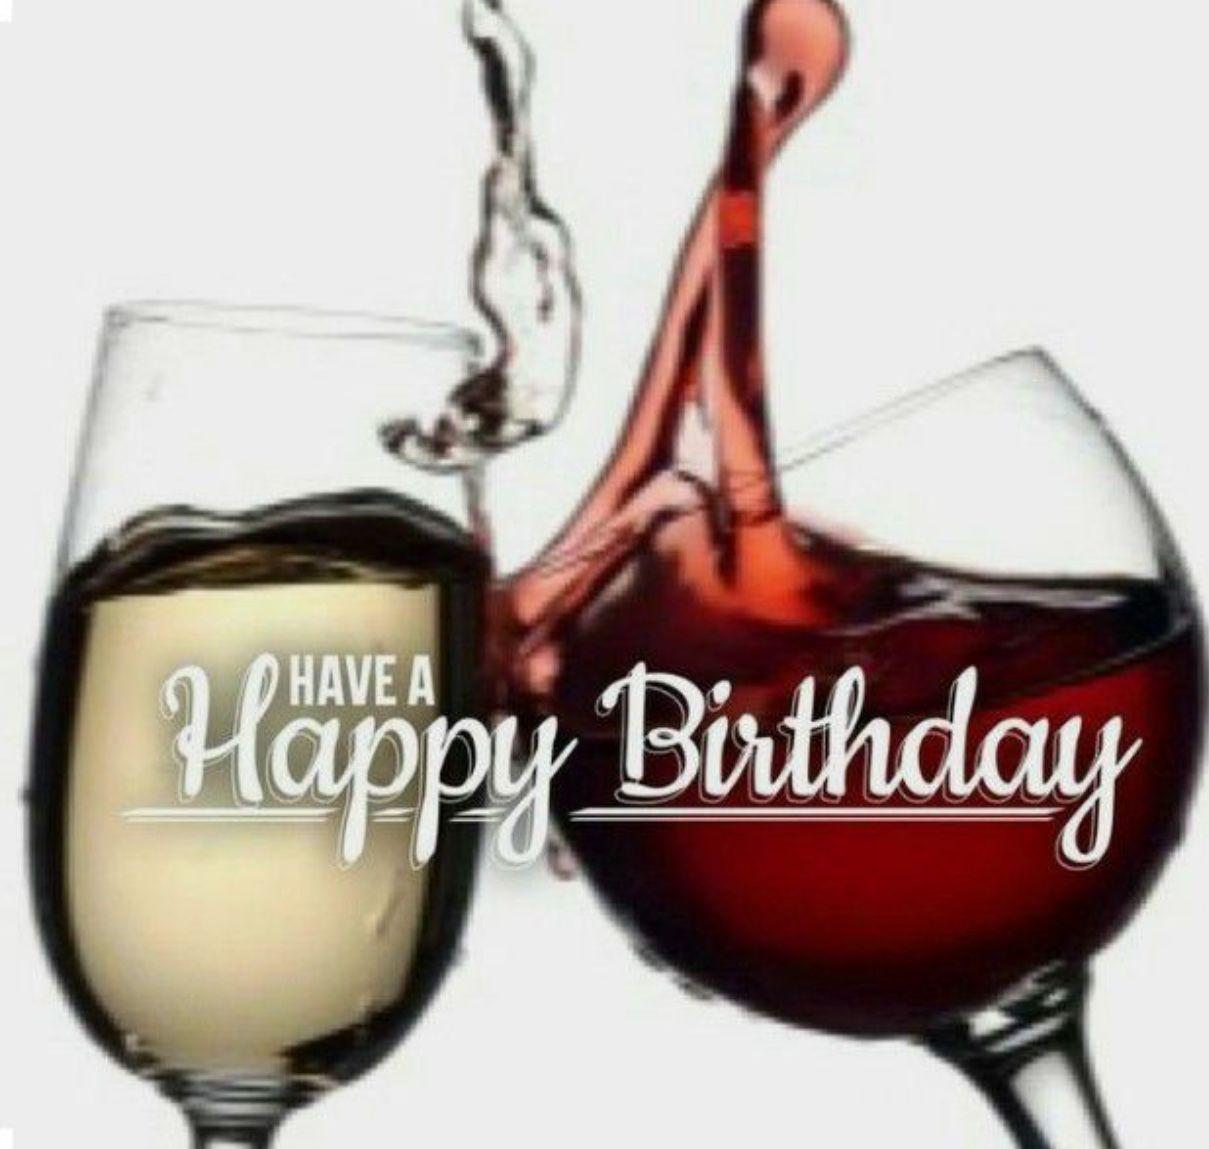 Pin By Teri Kramer On Holiday Birthday Happy Birthday Fun Happy Birthday Wine Happy Birthday Greetings